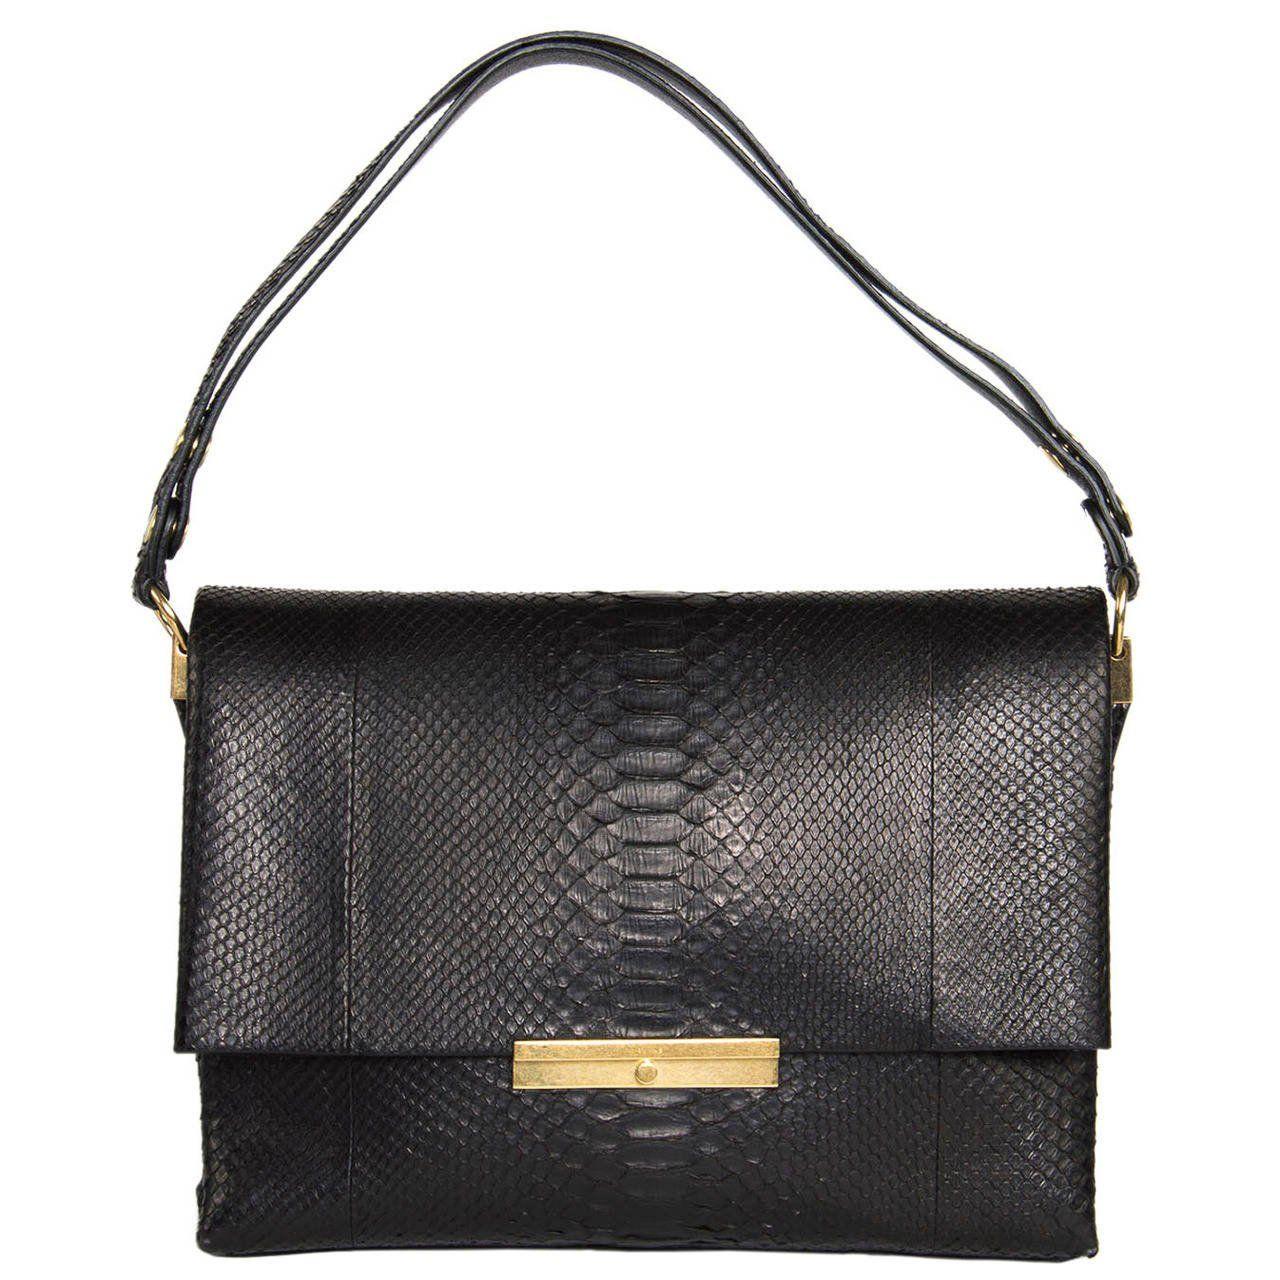 Celine Black Snake Skin Bag  6bff90dbbb46f